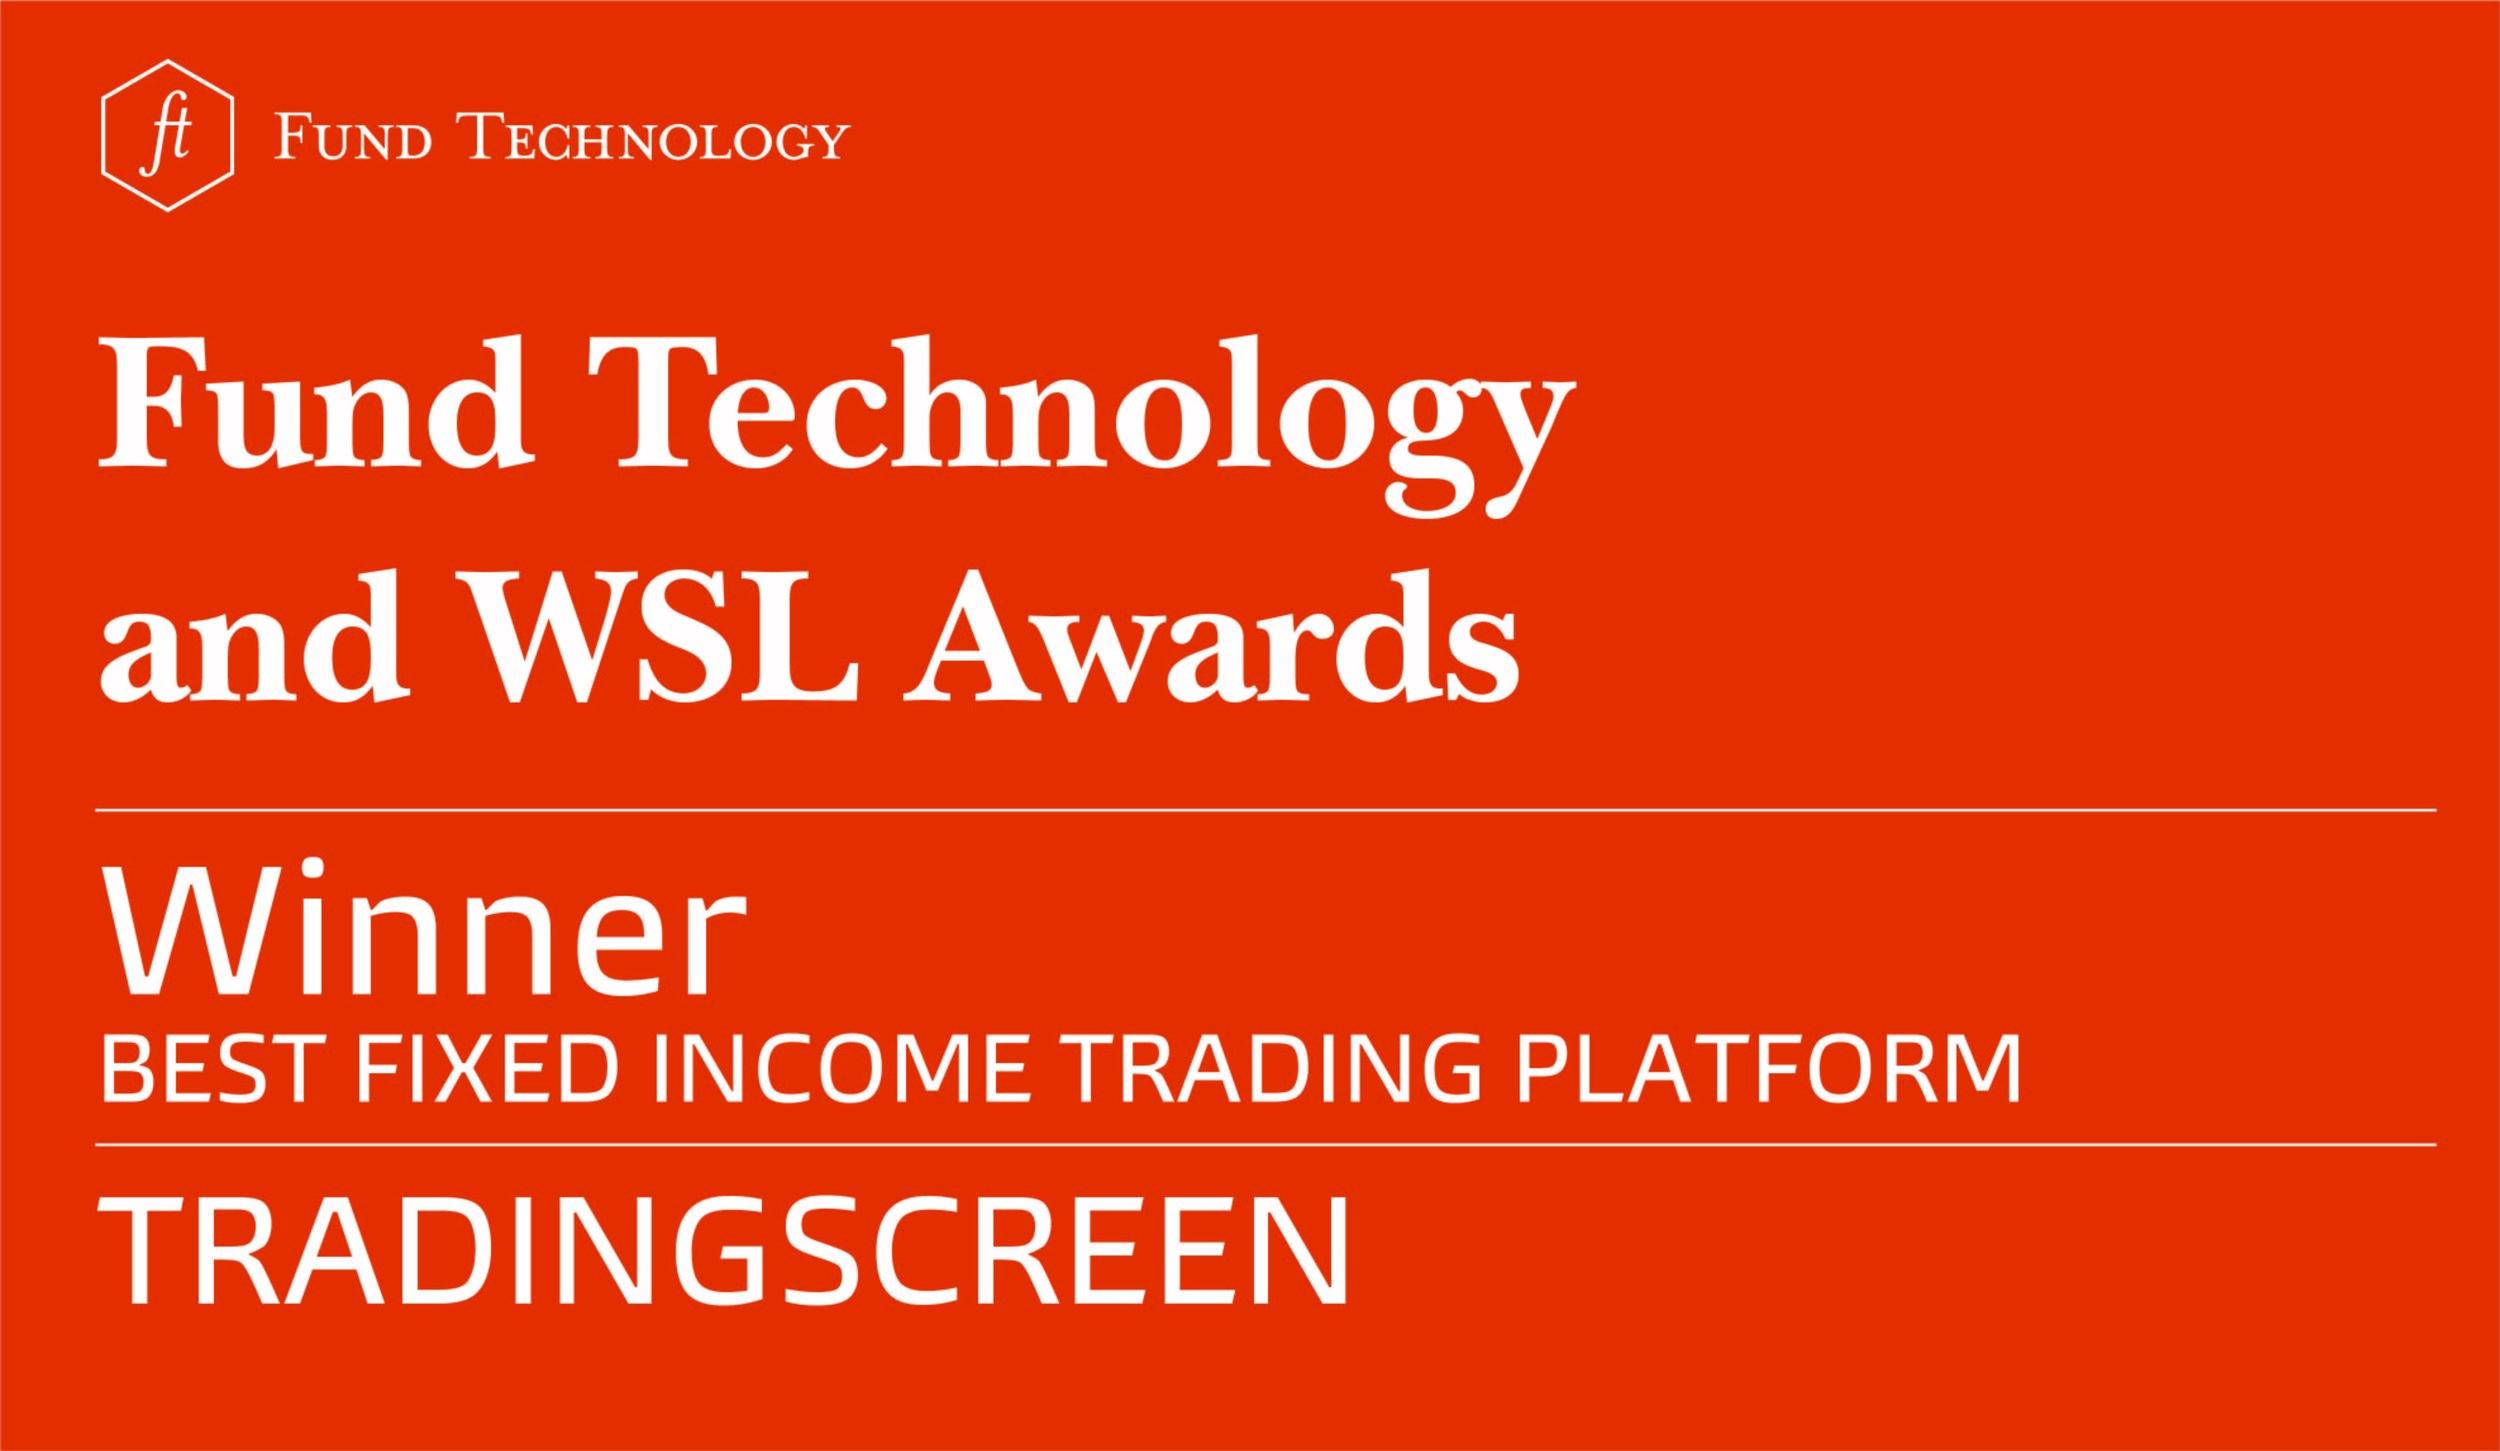 FI WSL 2017 Winner Best fixed income trading platform.jpg